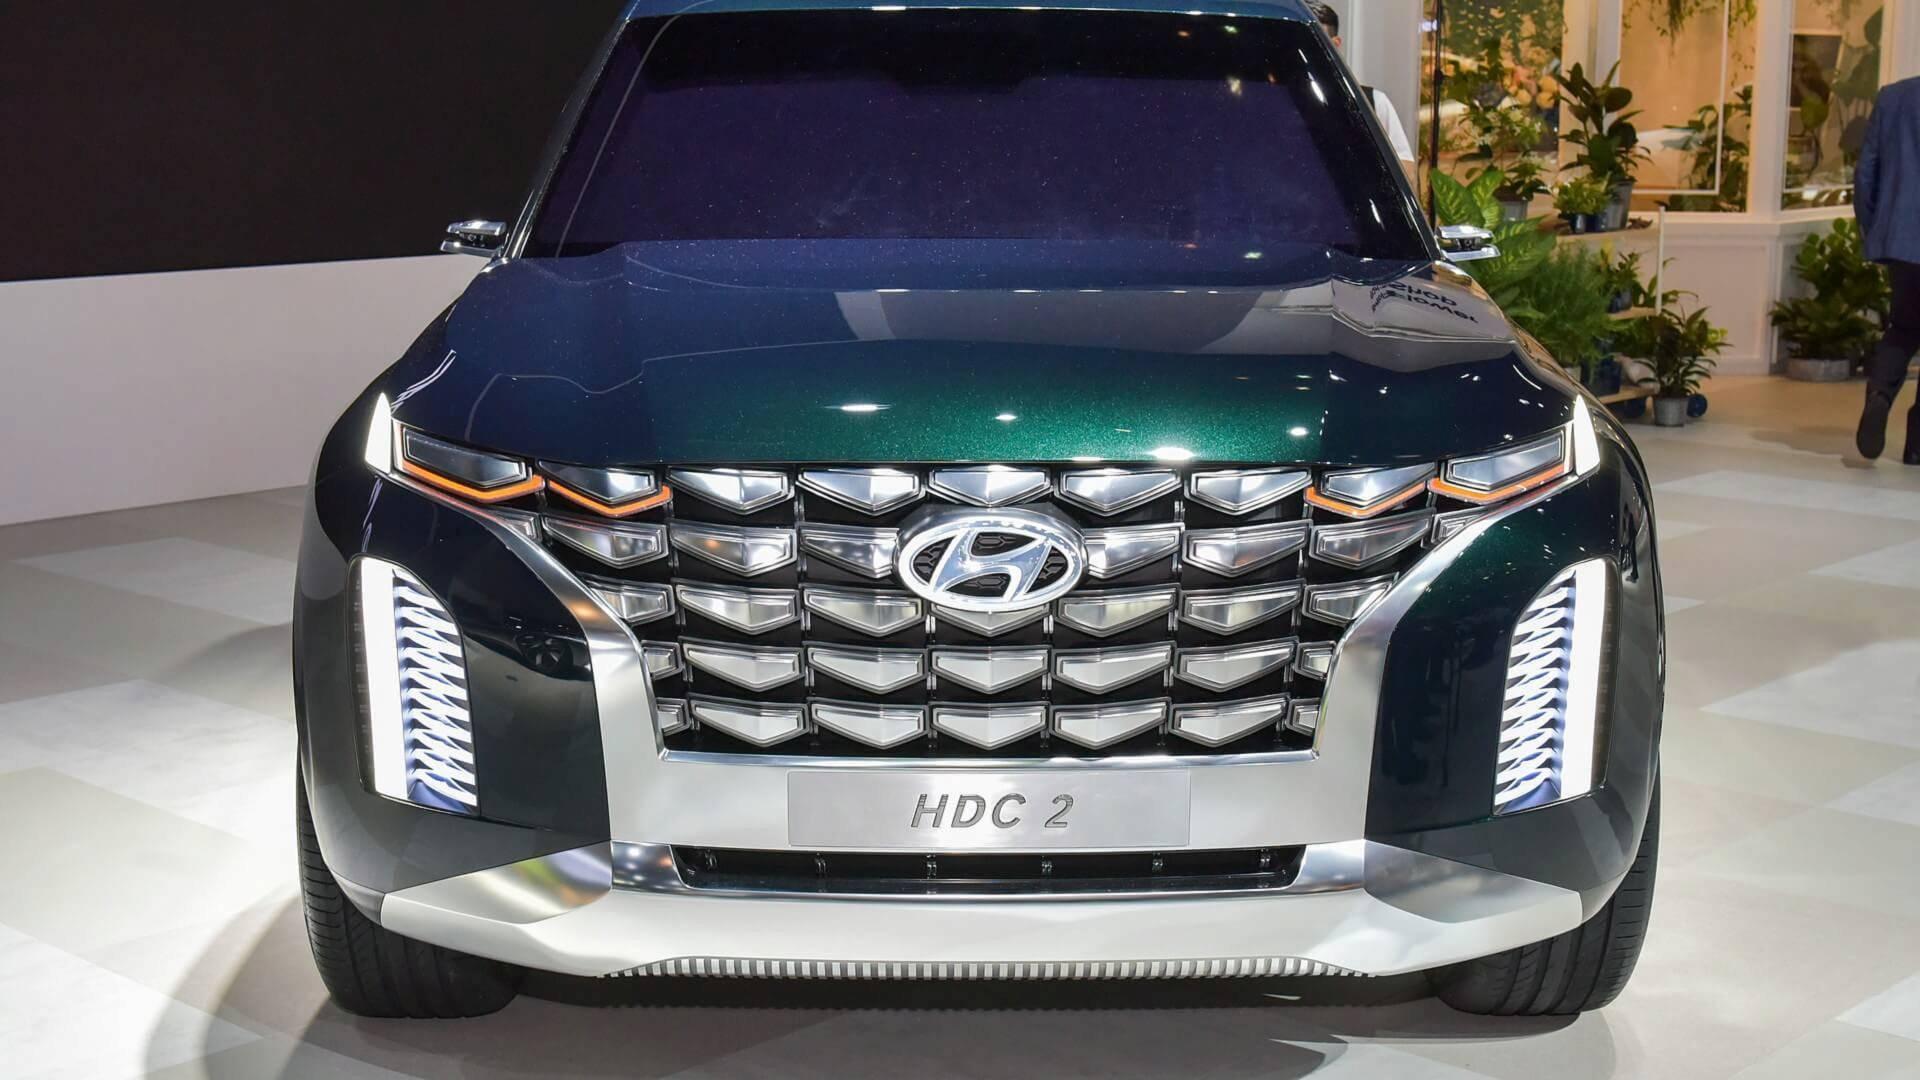 hyundai-hdc-2-grandmaster-concept-1 SUV-ul Hyundai se zvoneste a fi un concurent pentru Toyota Land Cruiser